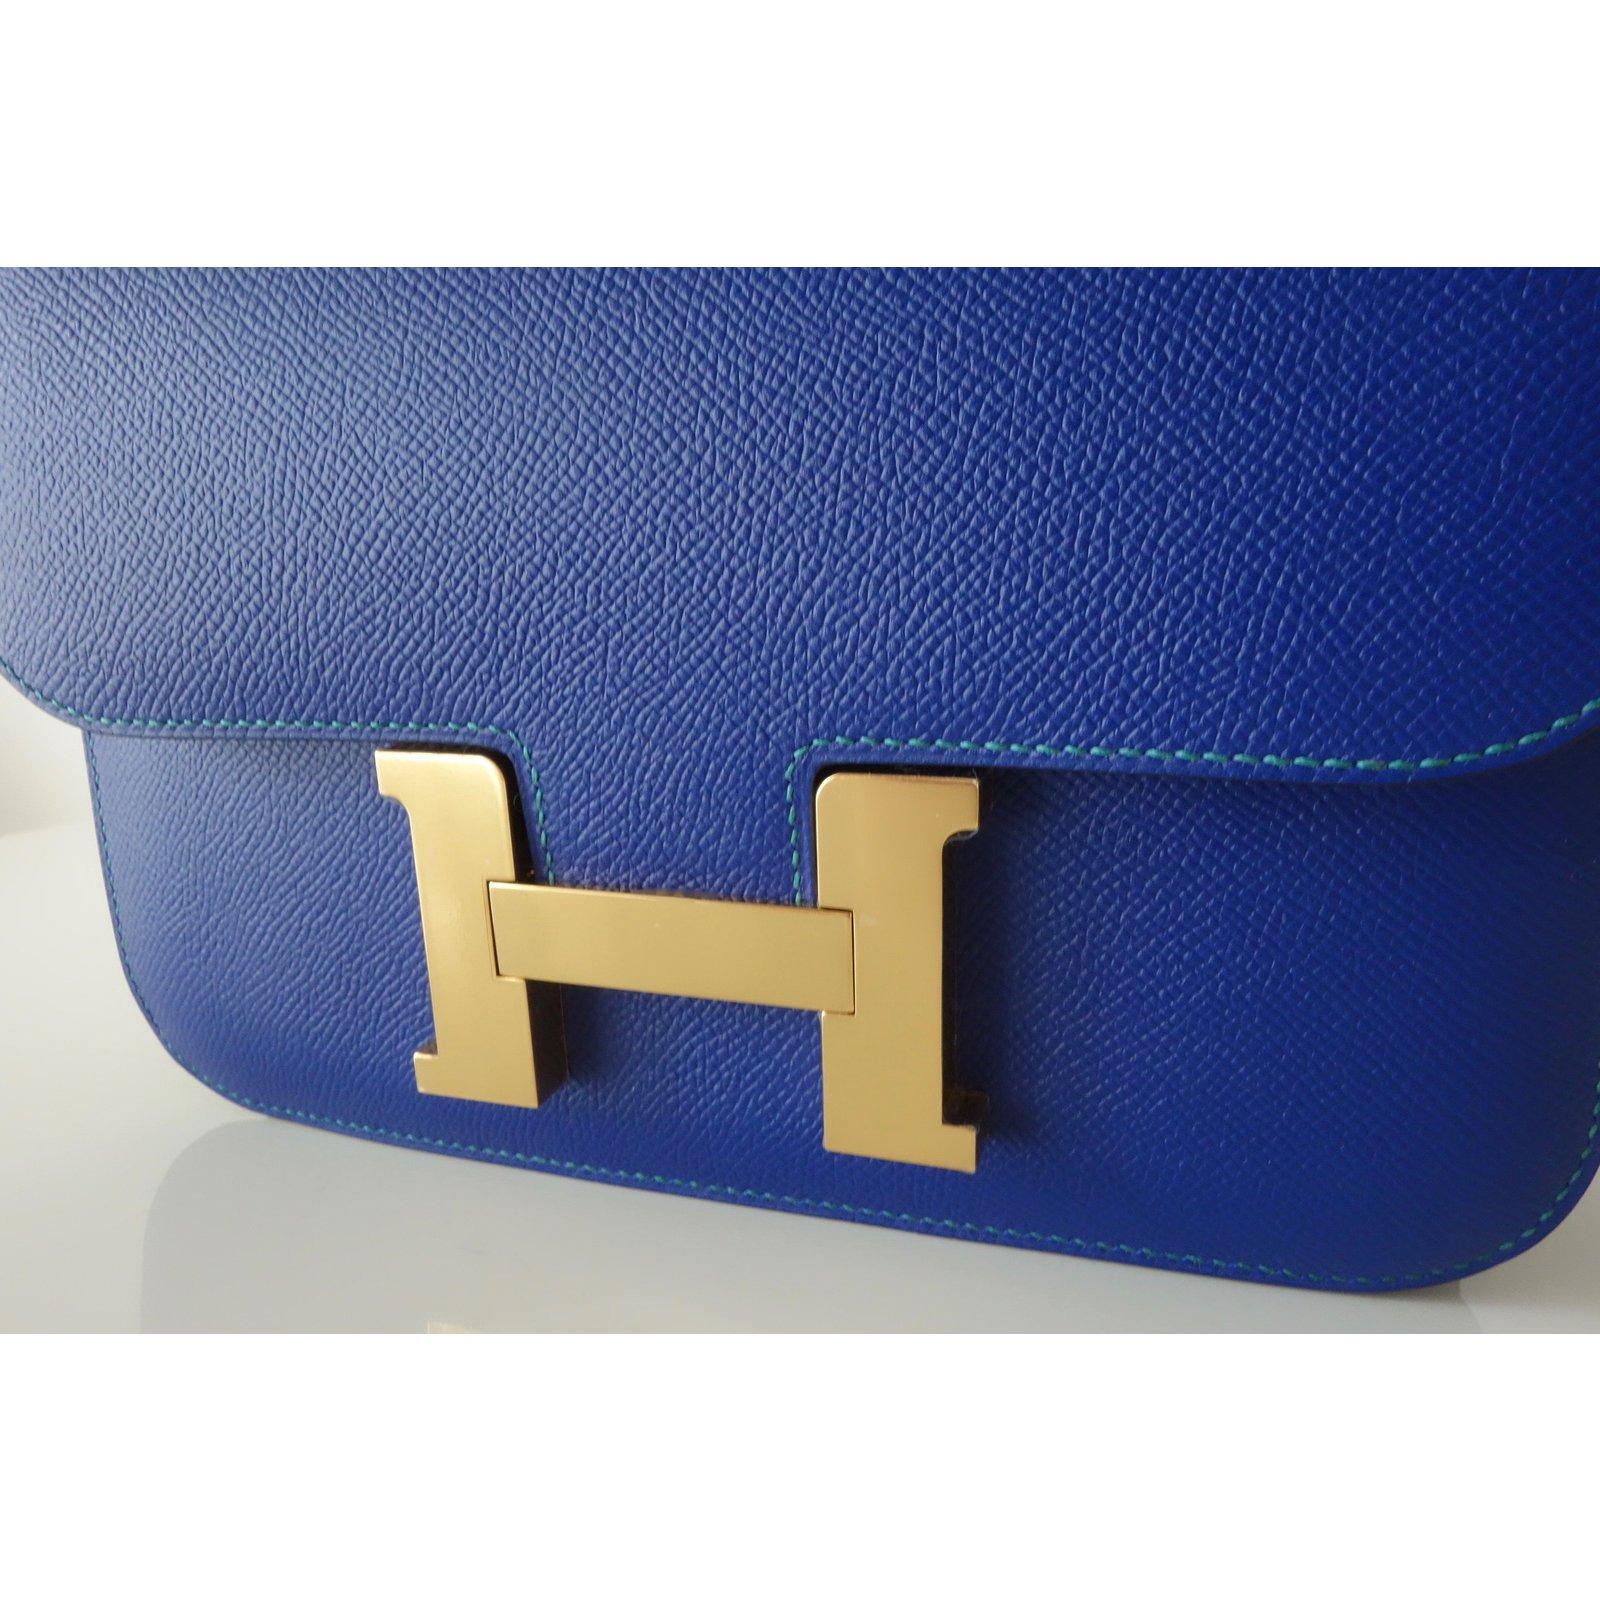 À Main Hermes Sacs Sac bleu Constance Cuir Bleu Hermès 24 Bicolore D9IWEH2